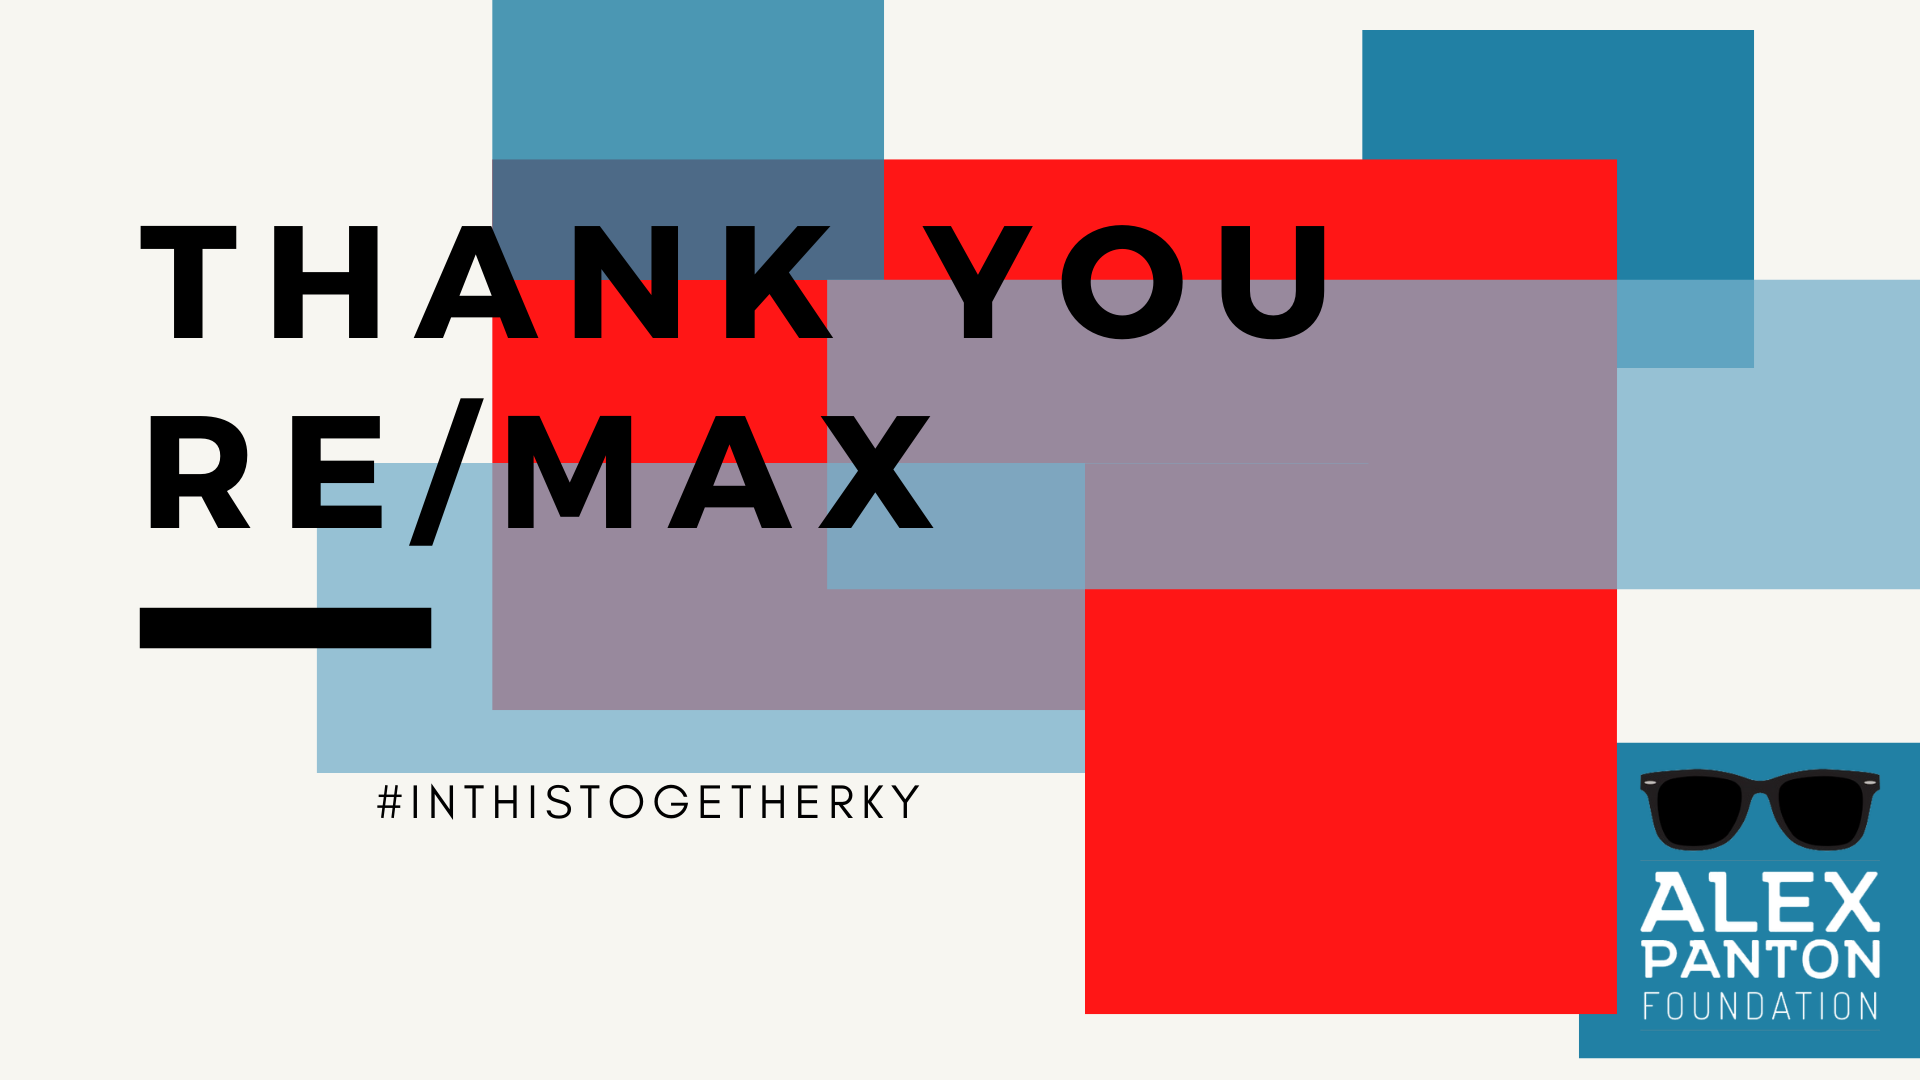 RE/MAX Donates CI$3,000 to Alex Panton Foundation